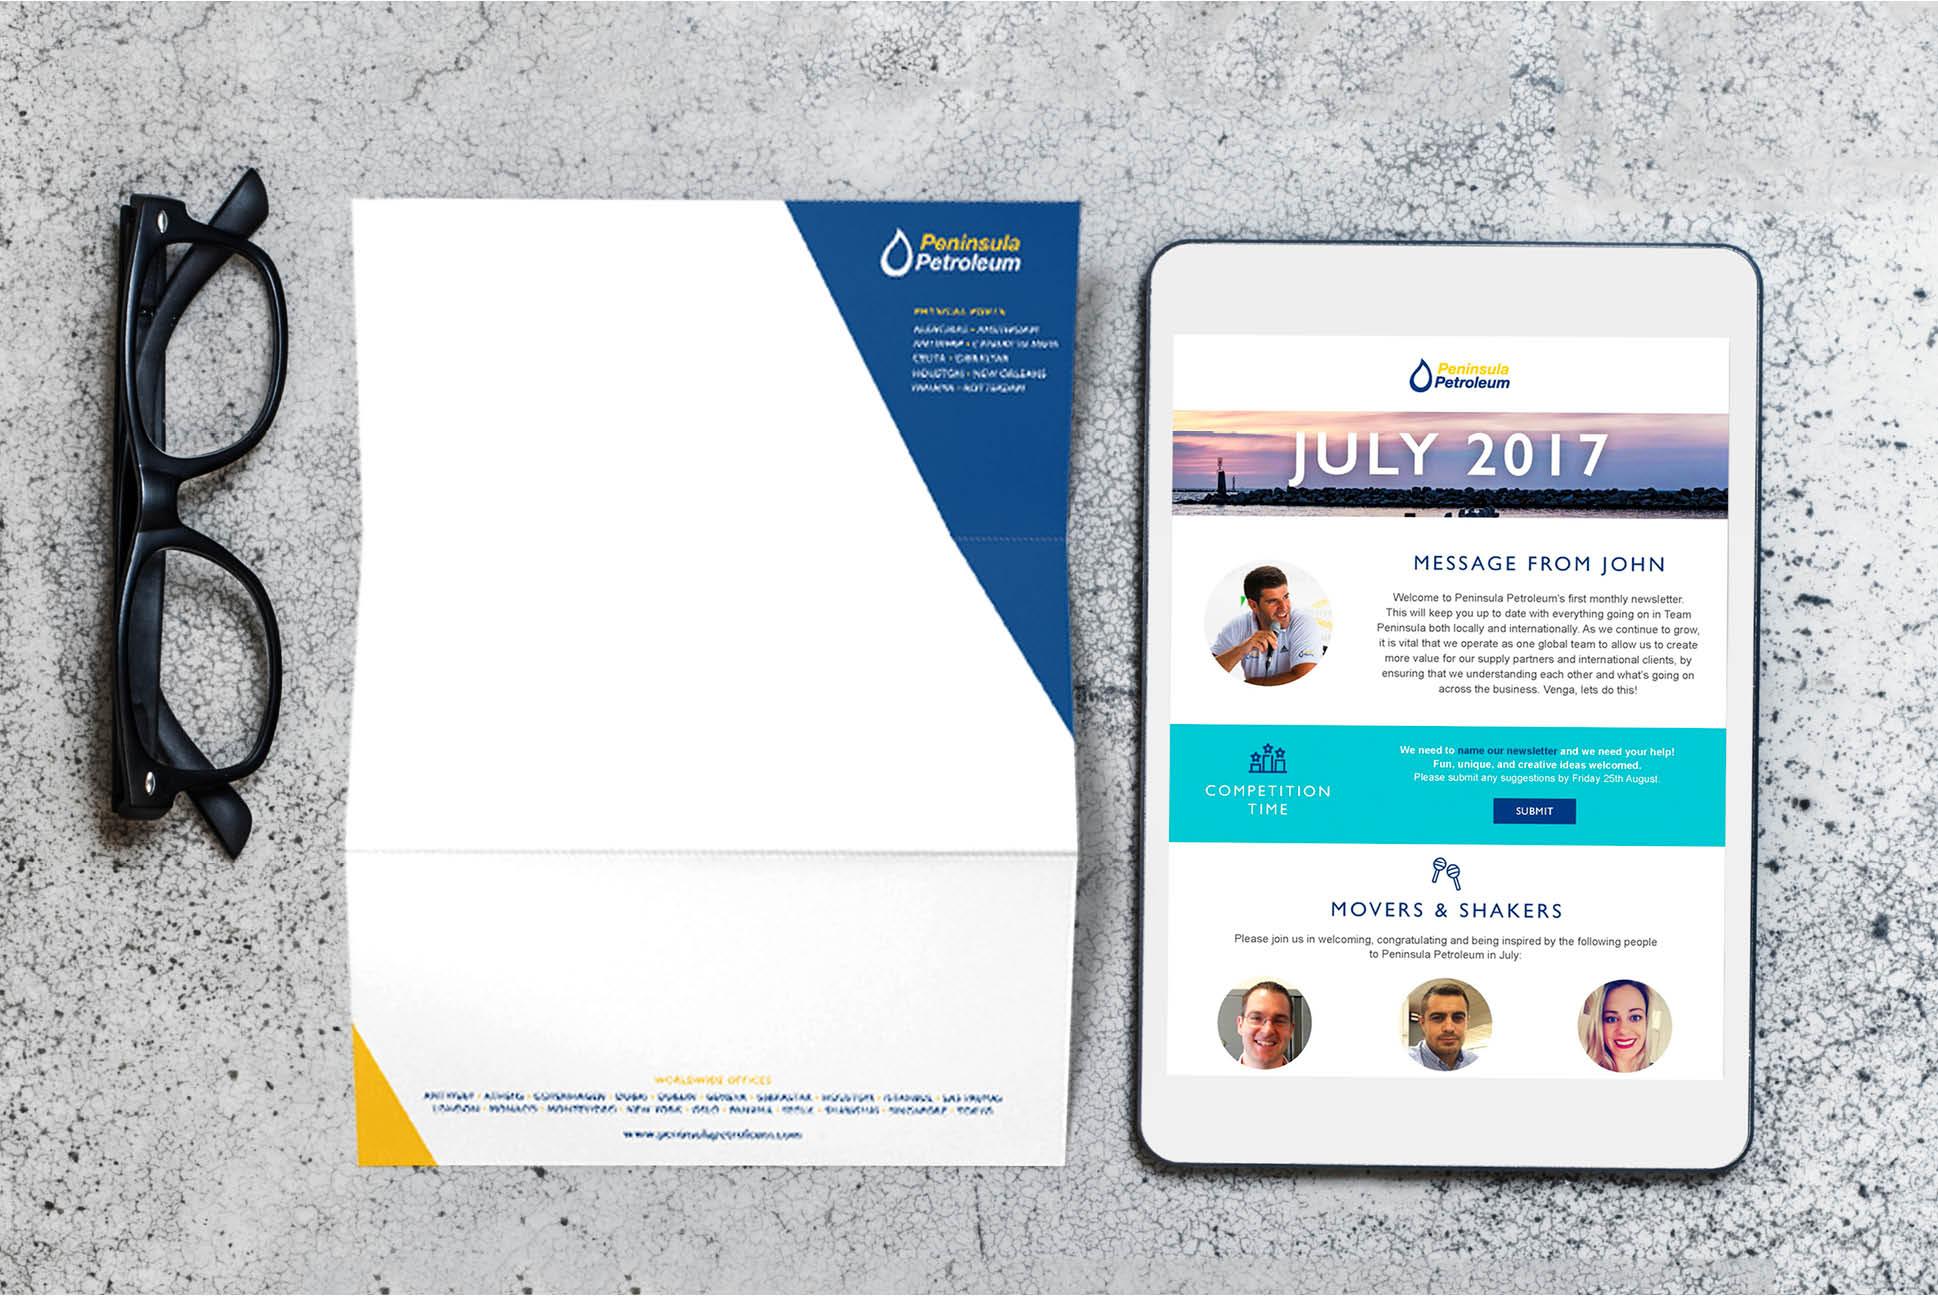 Peninsula Petroleum letterhead and email